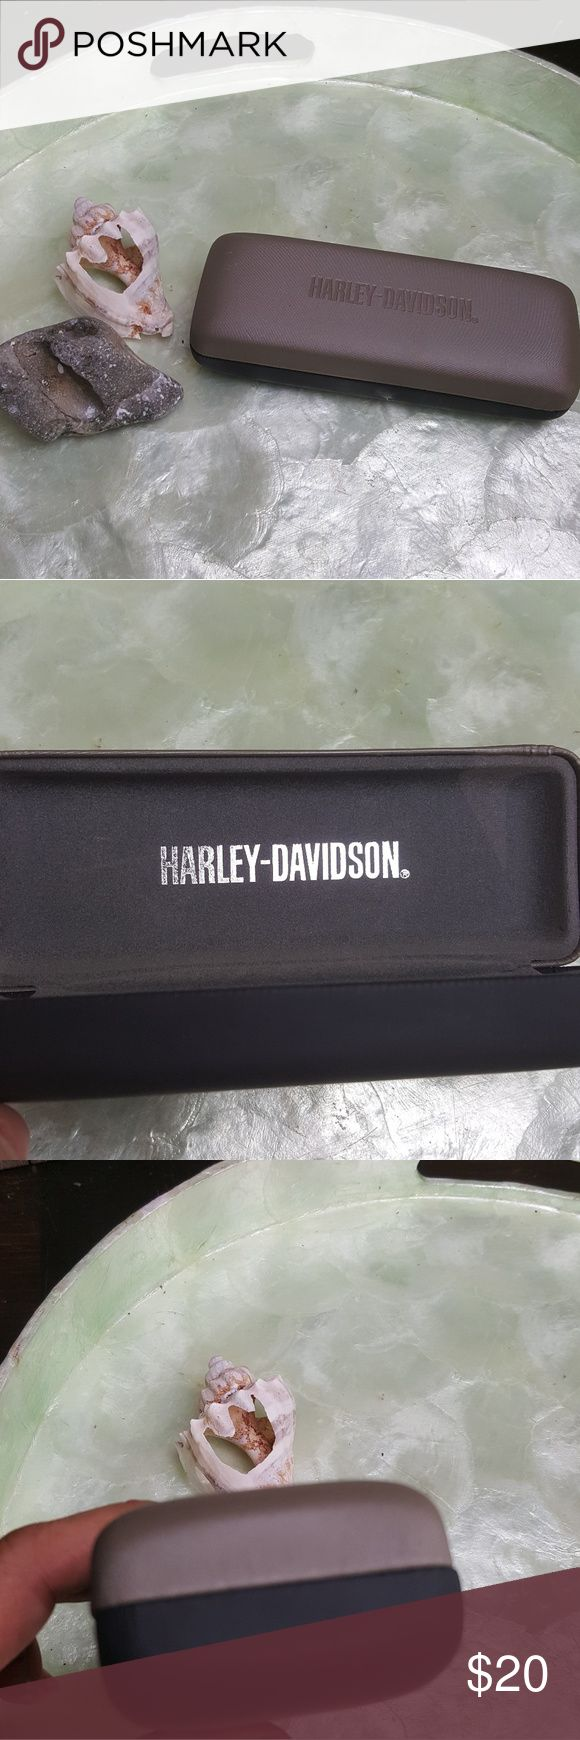 Harley-Davidson slim sunglasses case Very nice condition used HARLEY DAVIDSON Slim glasses case Harley-Davidson Accessories Sunglasses